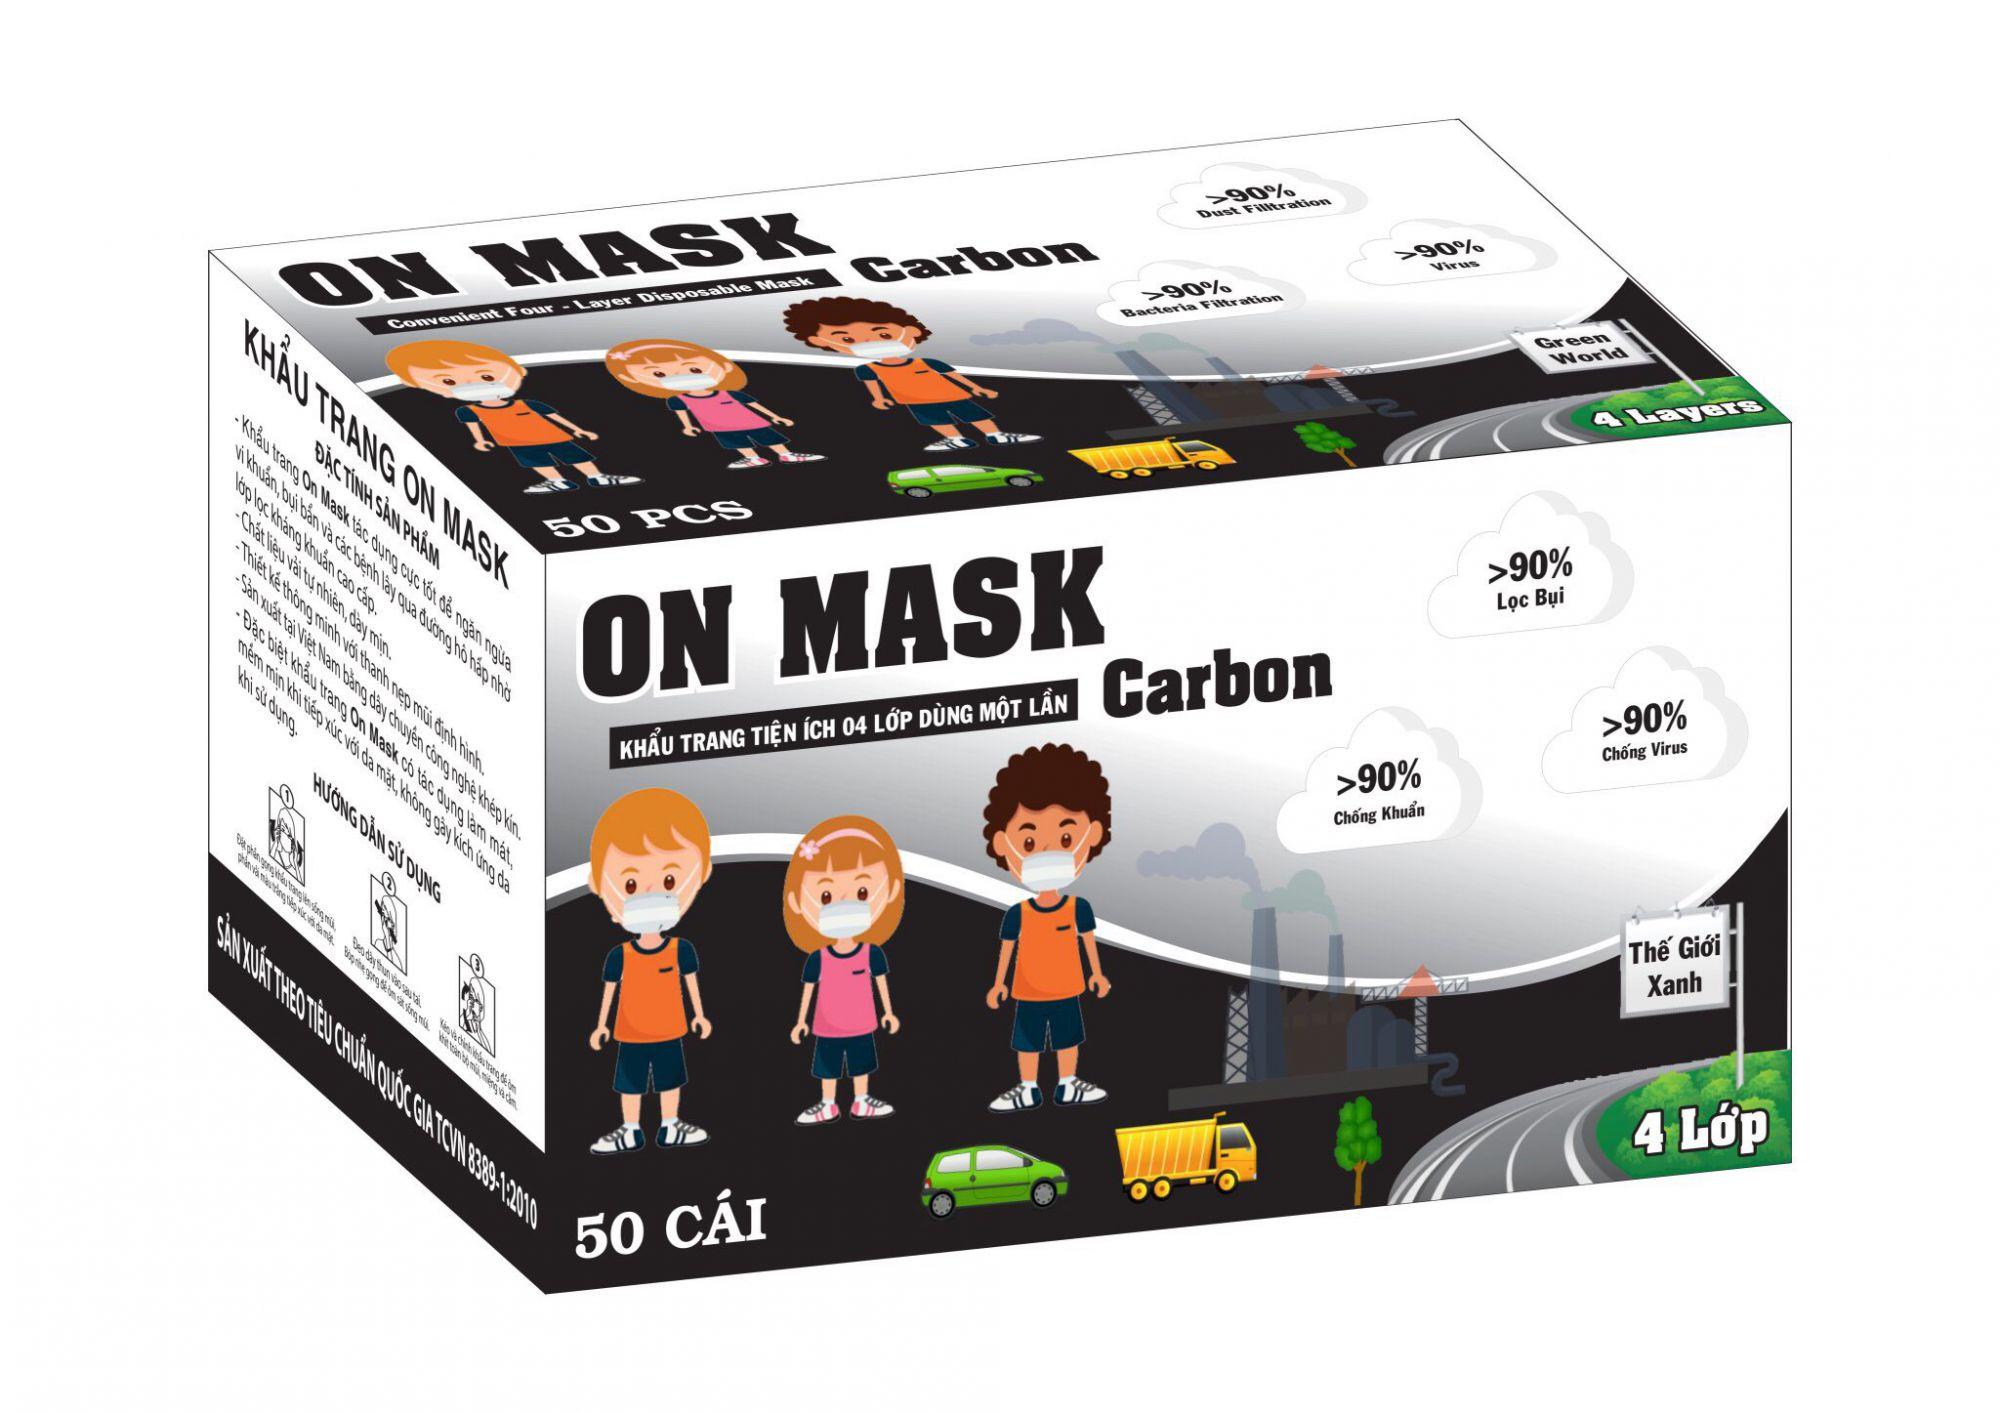 Khẩu Trang On Mask 4 Lớp CARBON